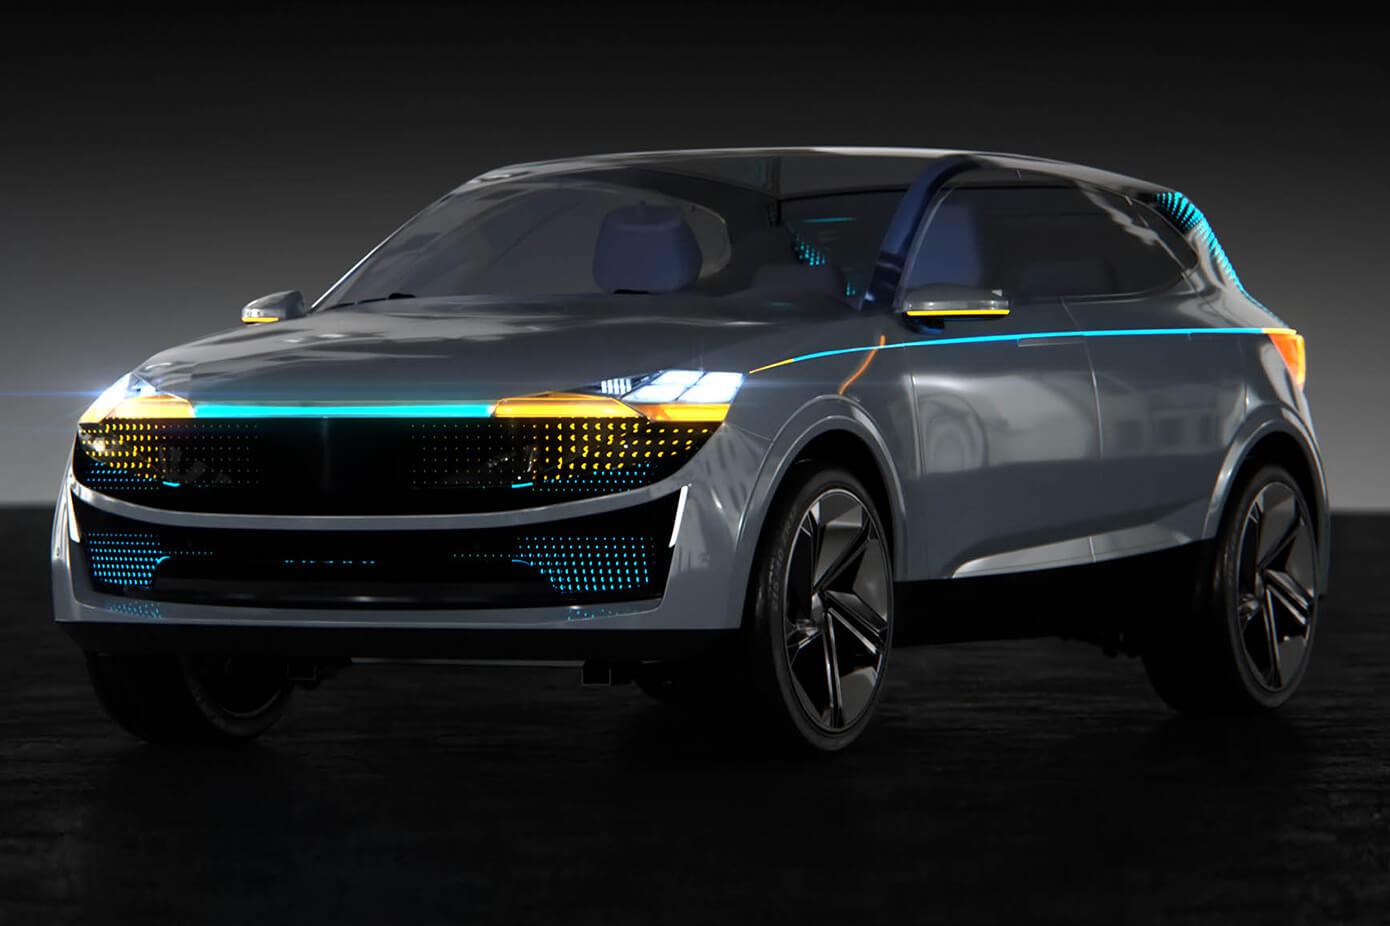 automotive_exterior_LED_headlights_VCSEL_LIDAR_ADAS_autonomous_driving_dam-13131361_1390x956